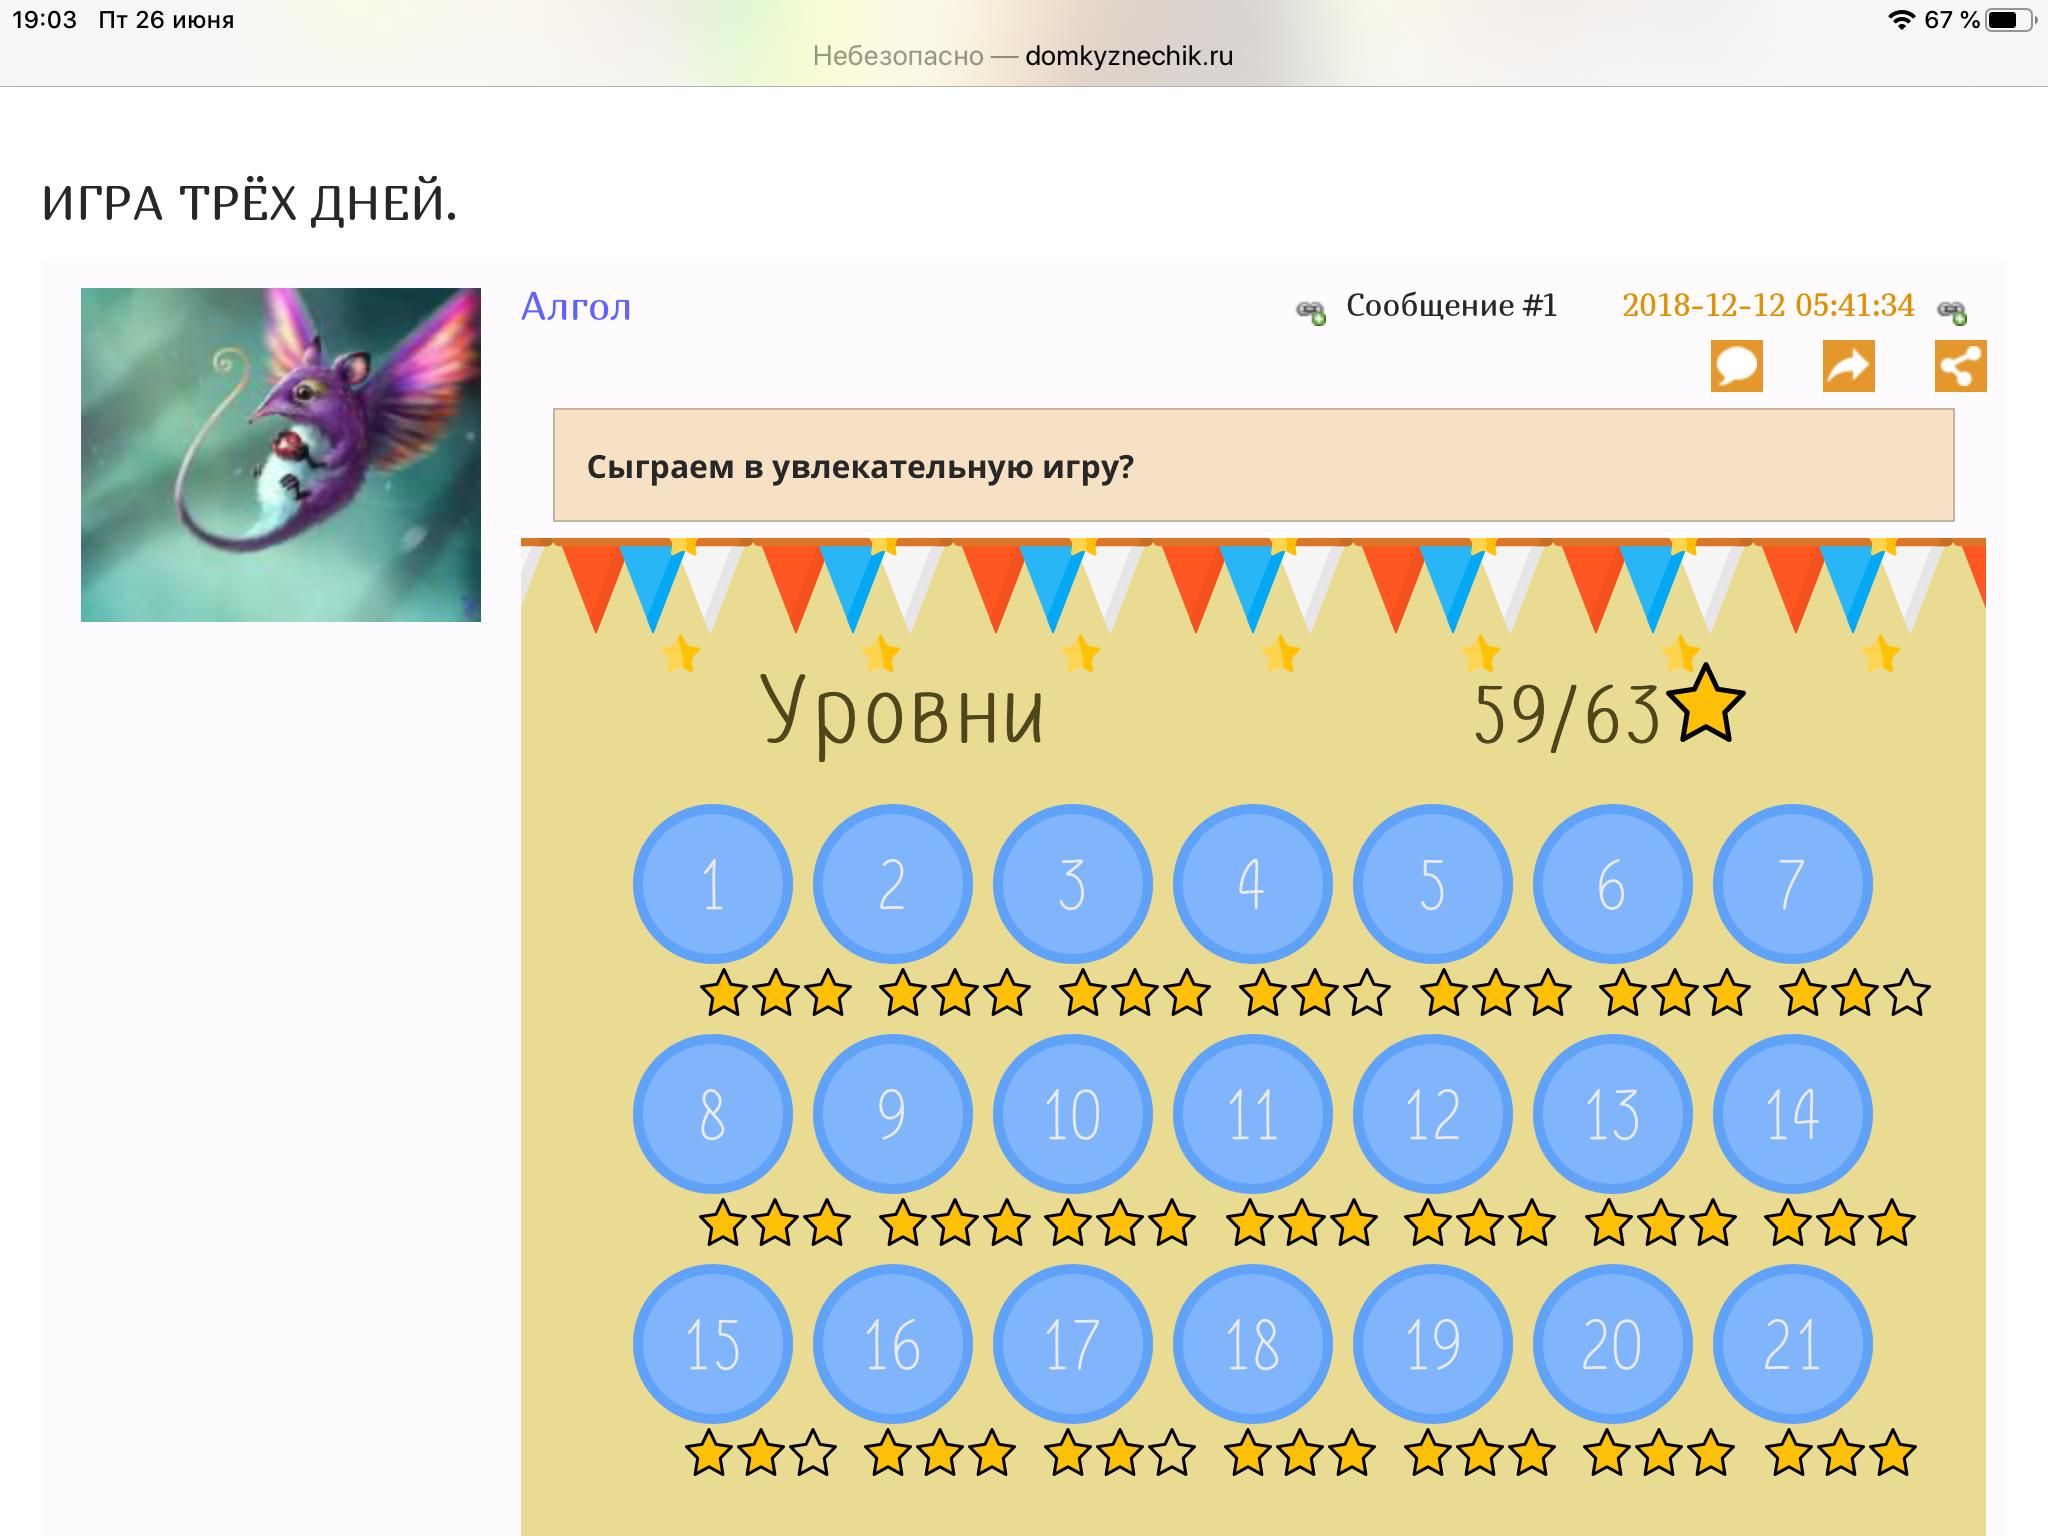 https://i5.imageban.ru/out/2020/06/26/0a007e30fe40493aeb75c2fe1c368543.png